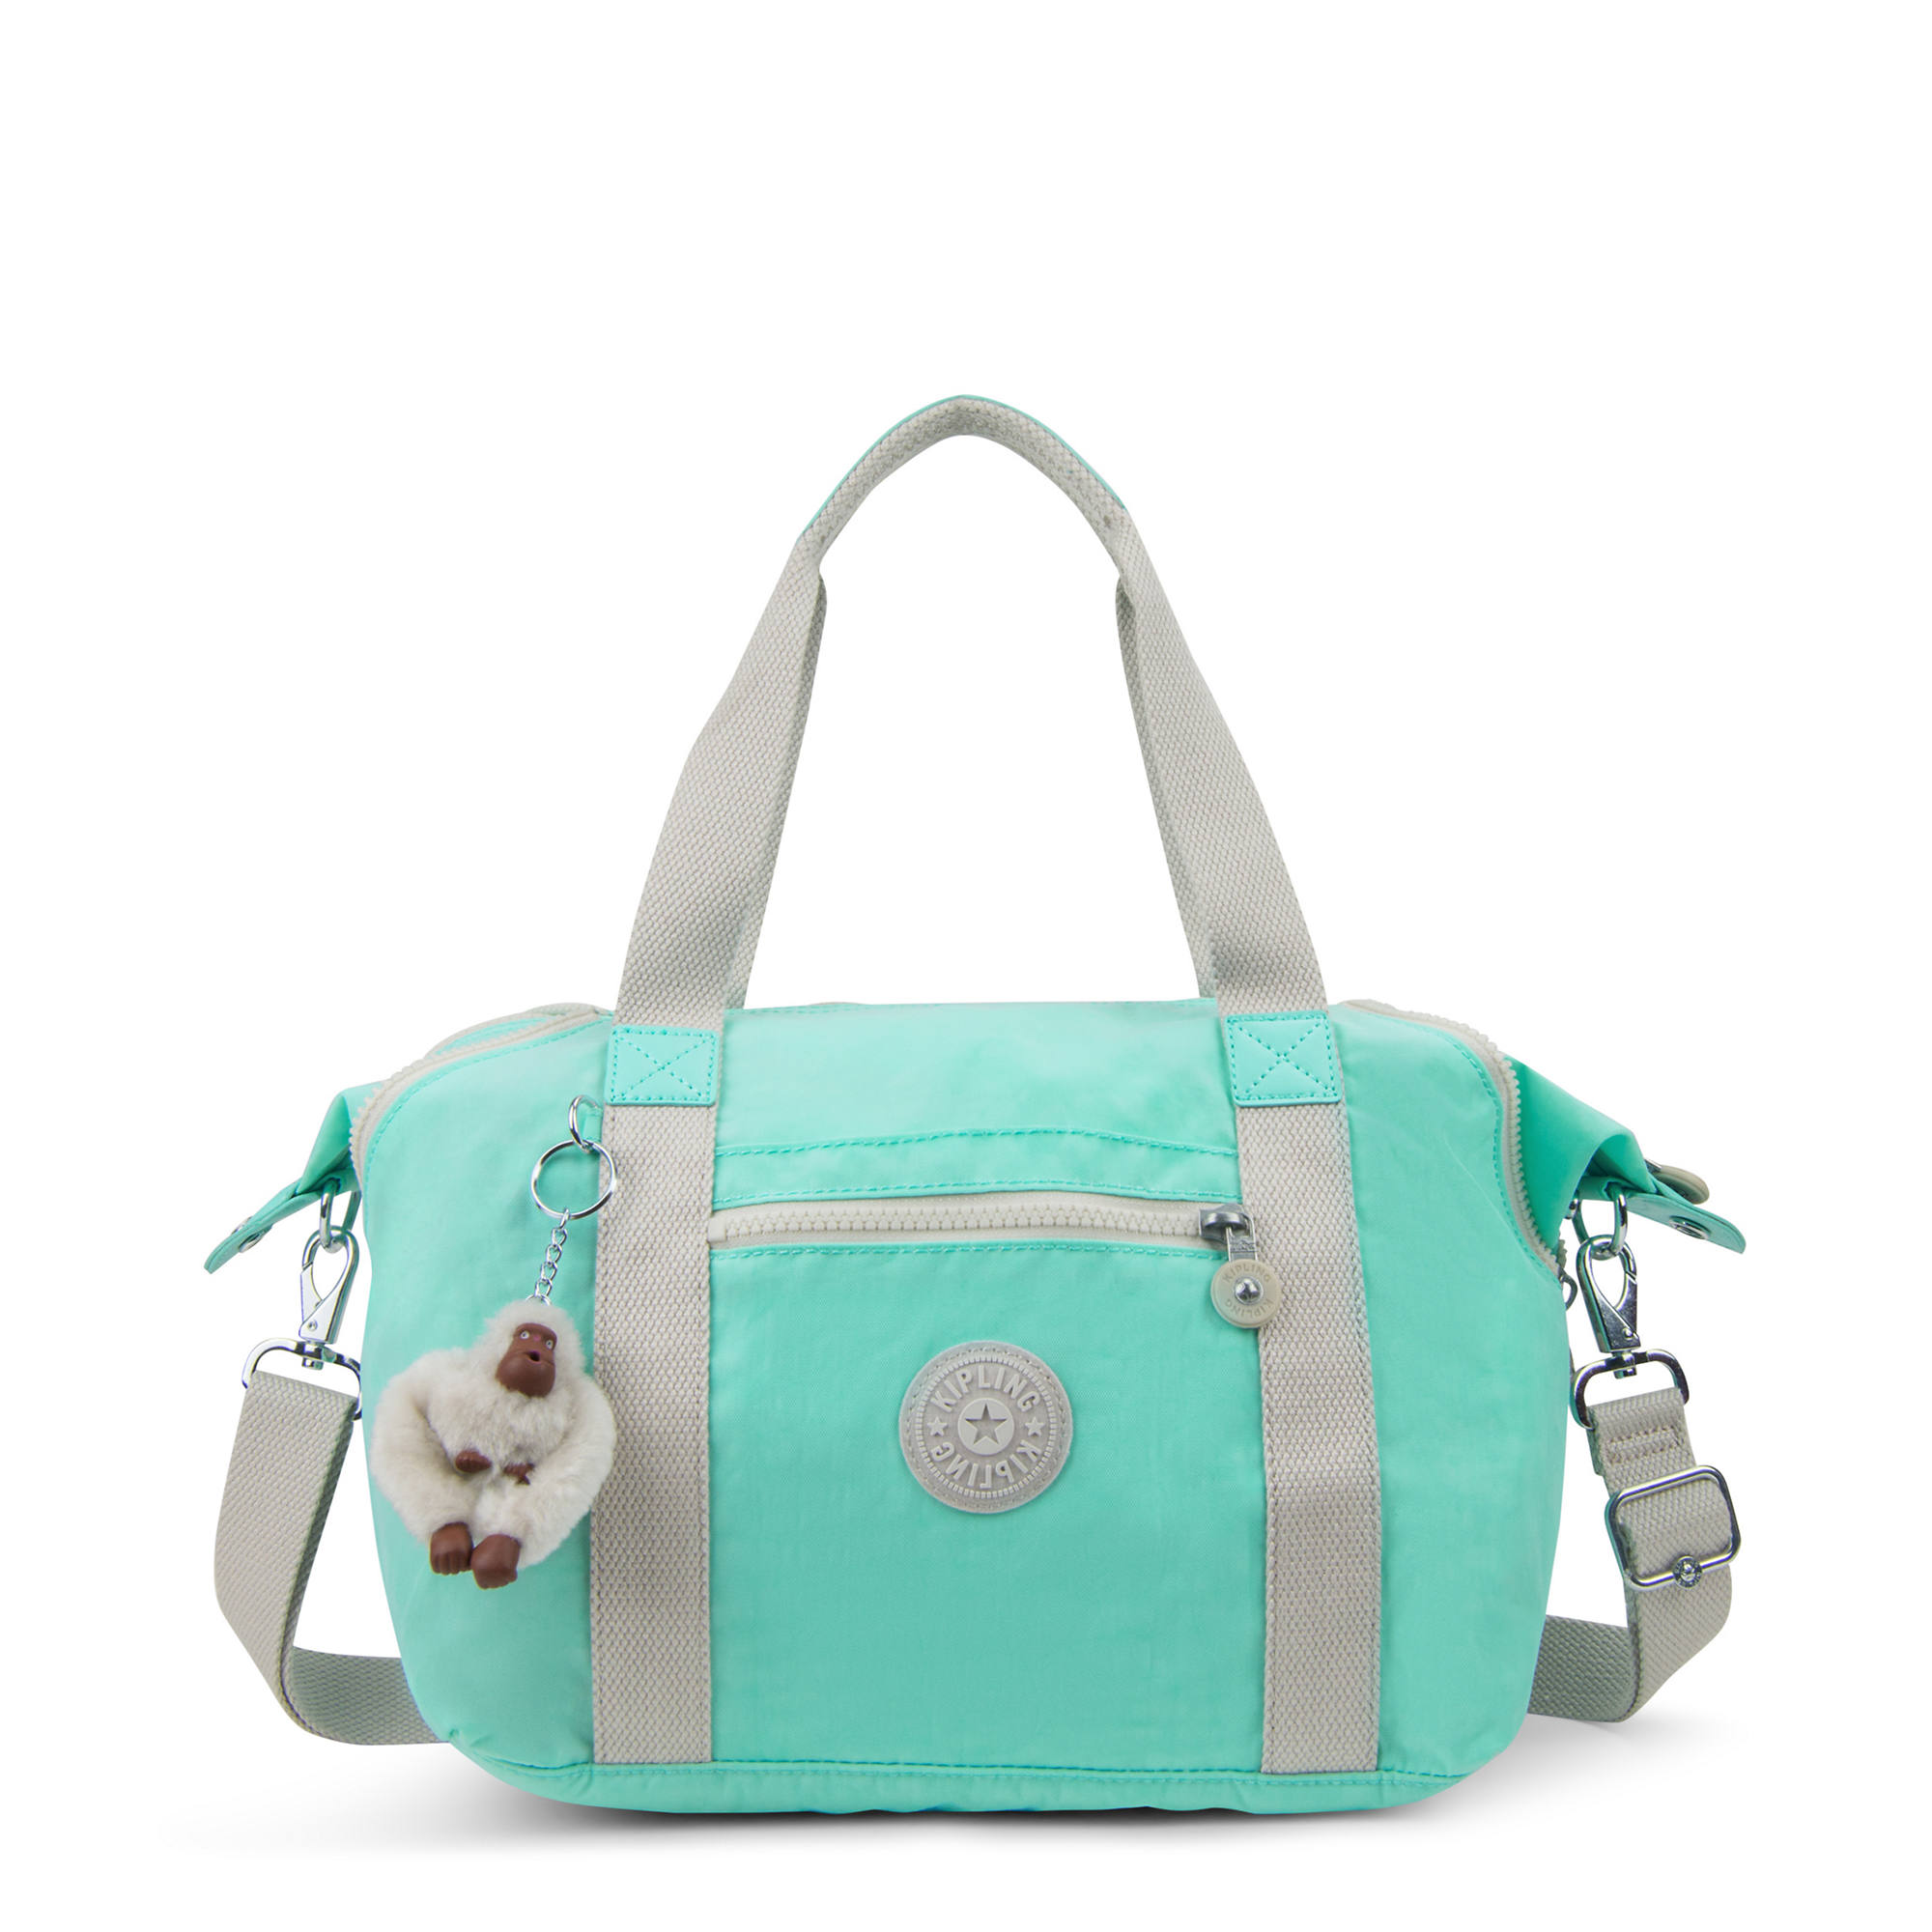 676727c63d Art Small Handbag,Fresh Teal,large